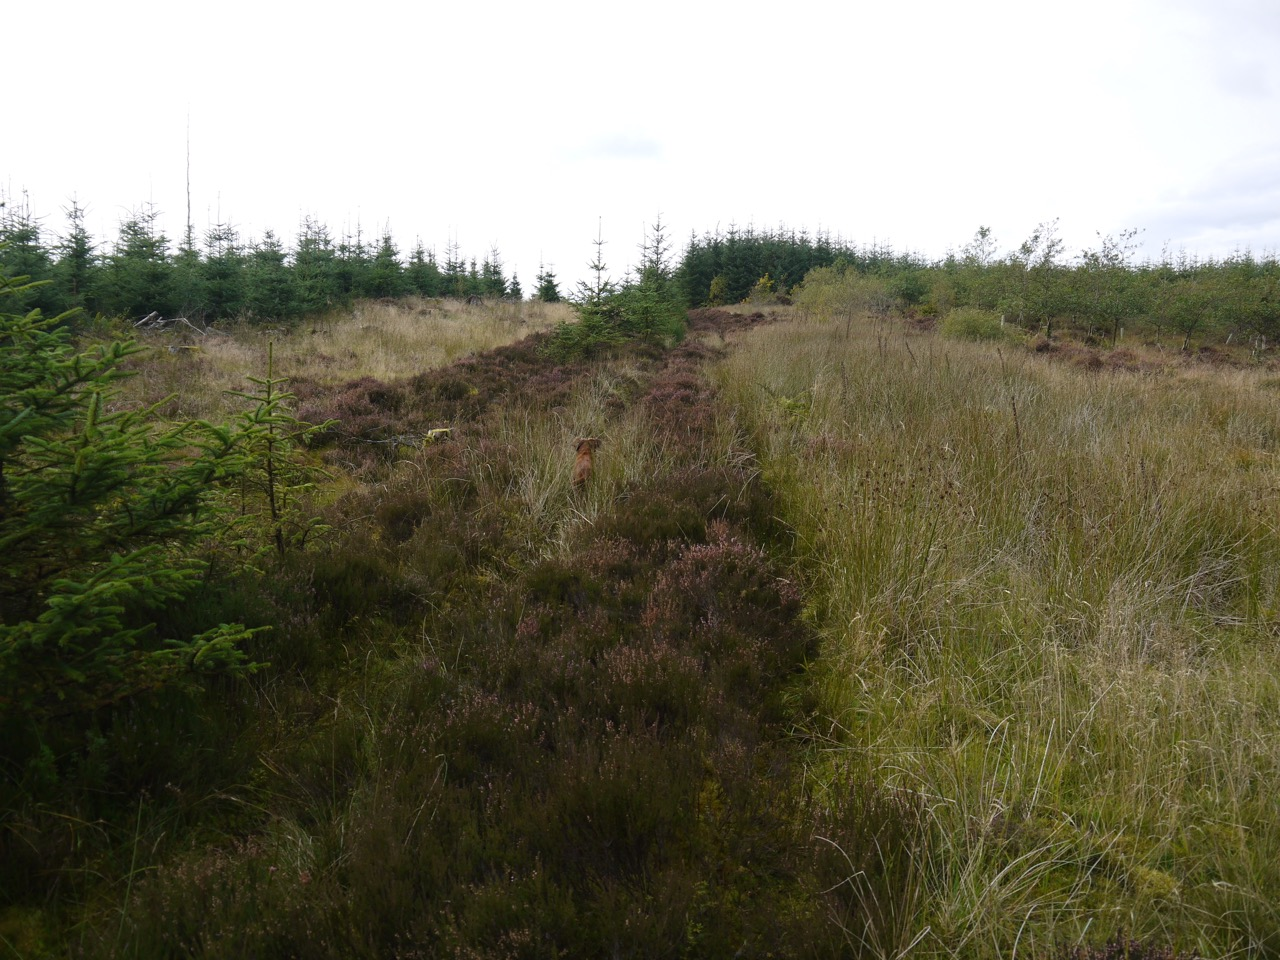 More of Gawinmoor Road